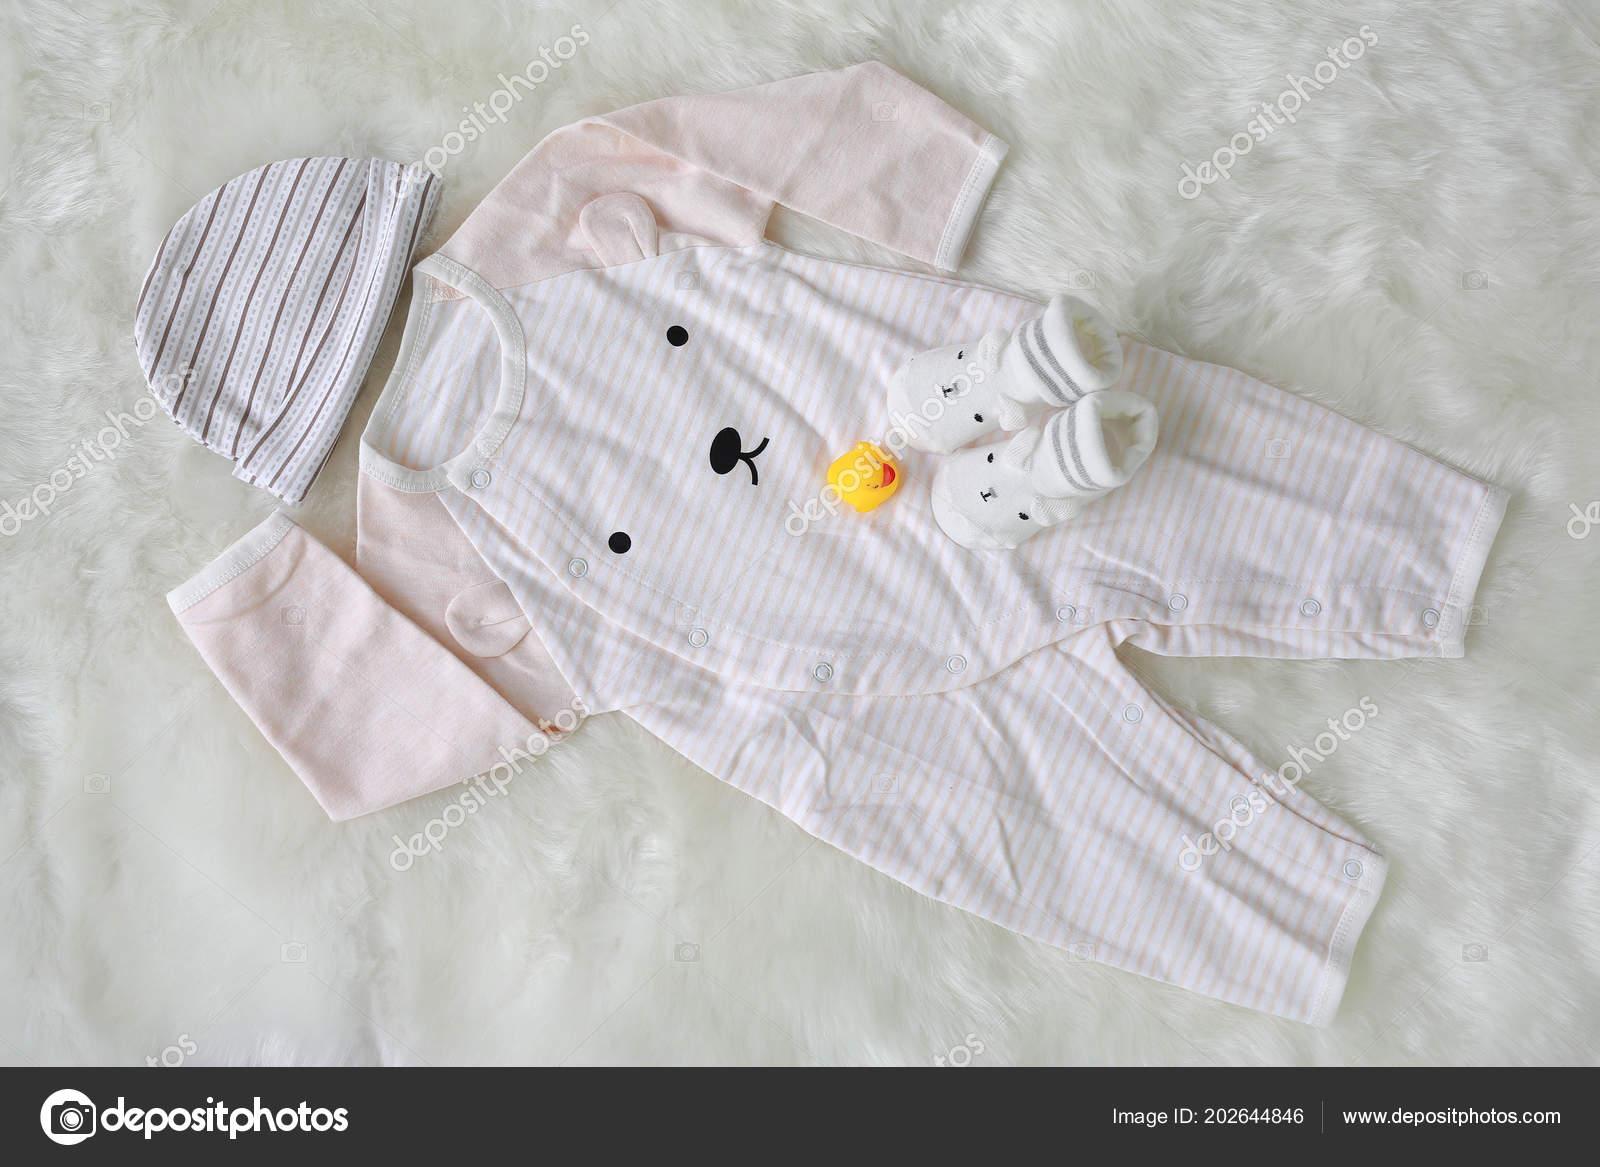 b98b514bd40e8 Collection Items Bodysuits Newborn Babies Socks Towel White Fur ...